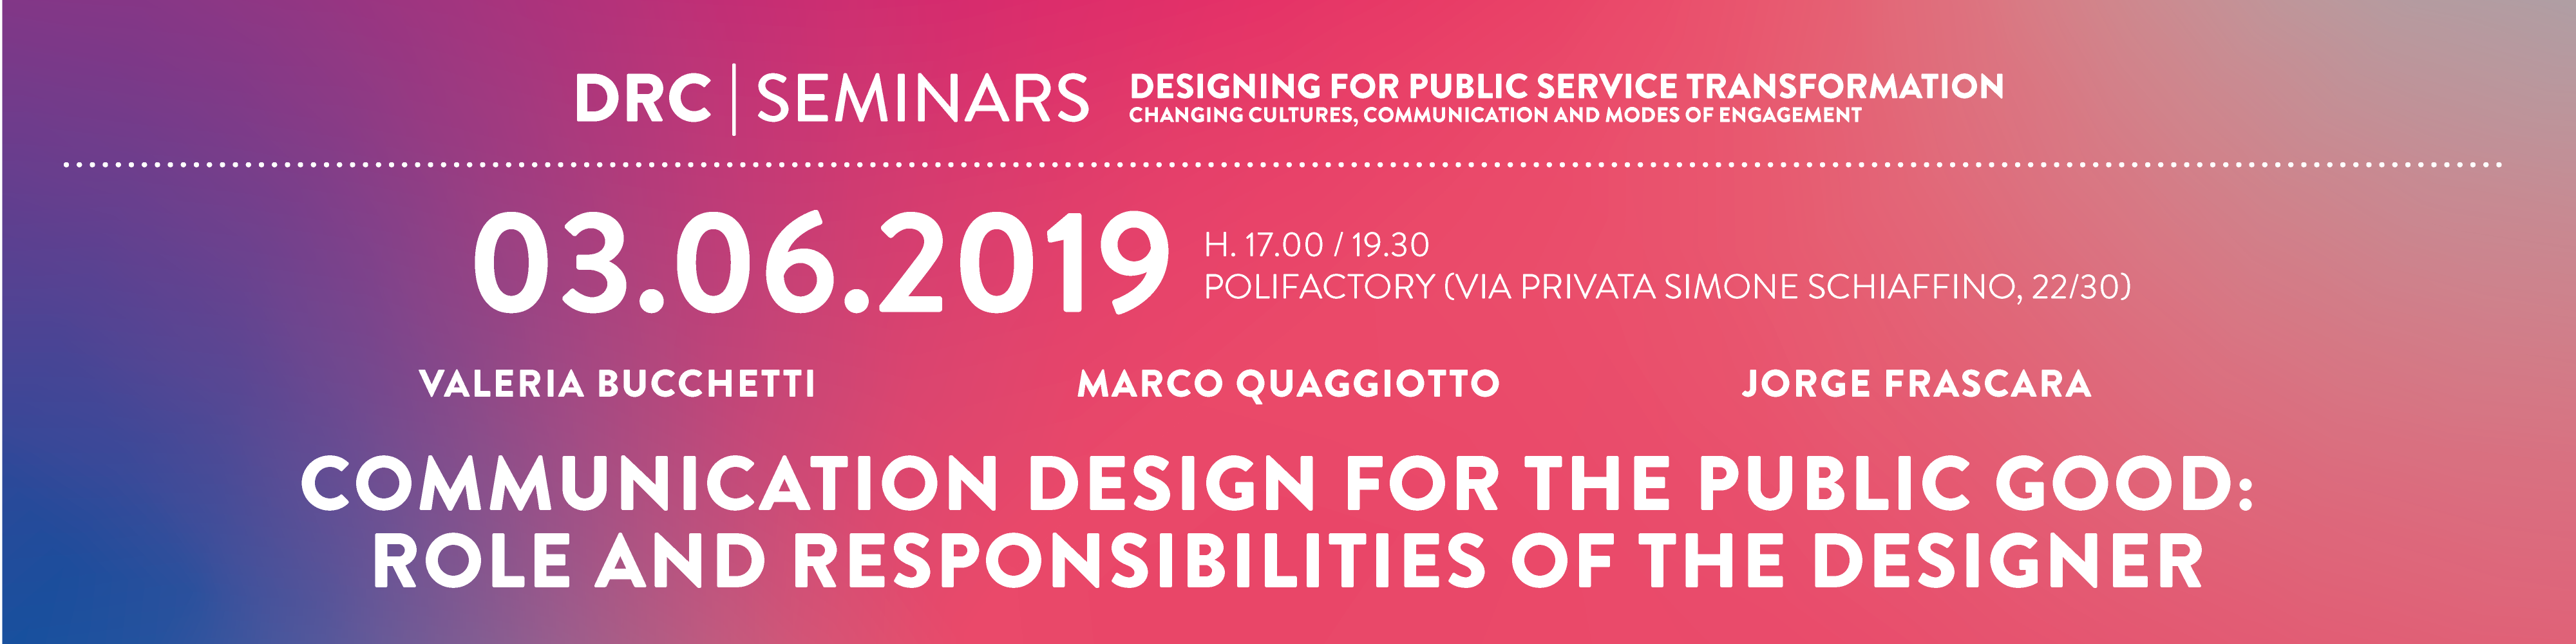 Drc19 Communication Design For The Public Good Phd Design